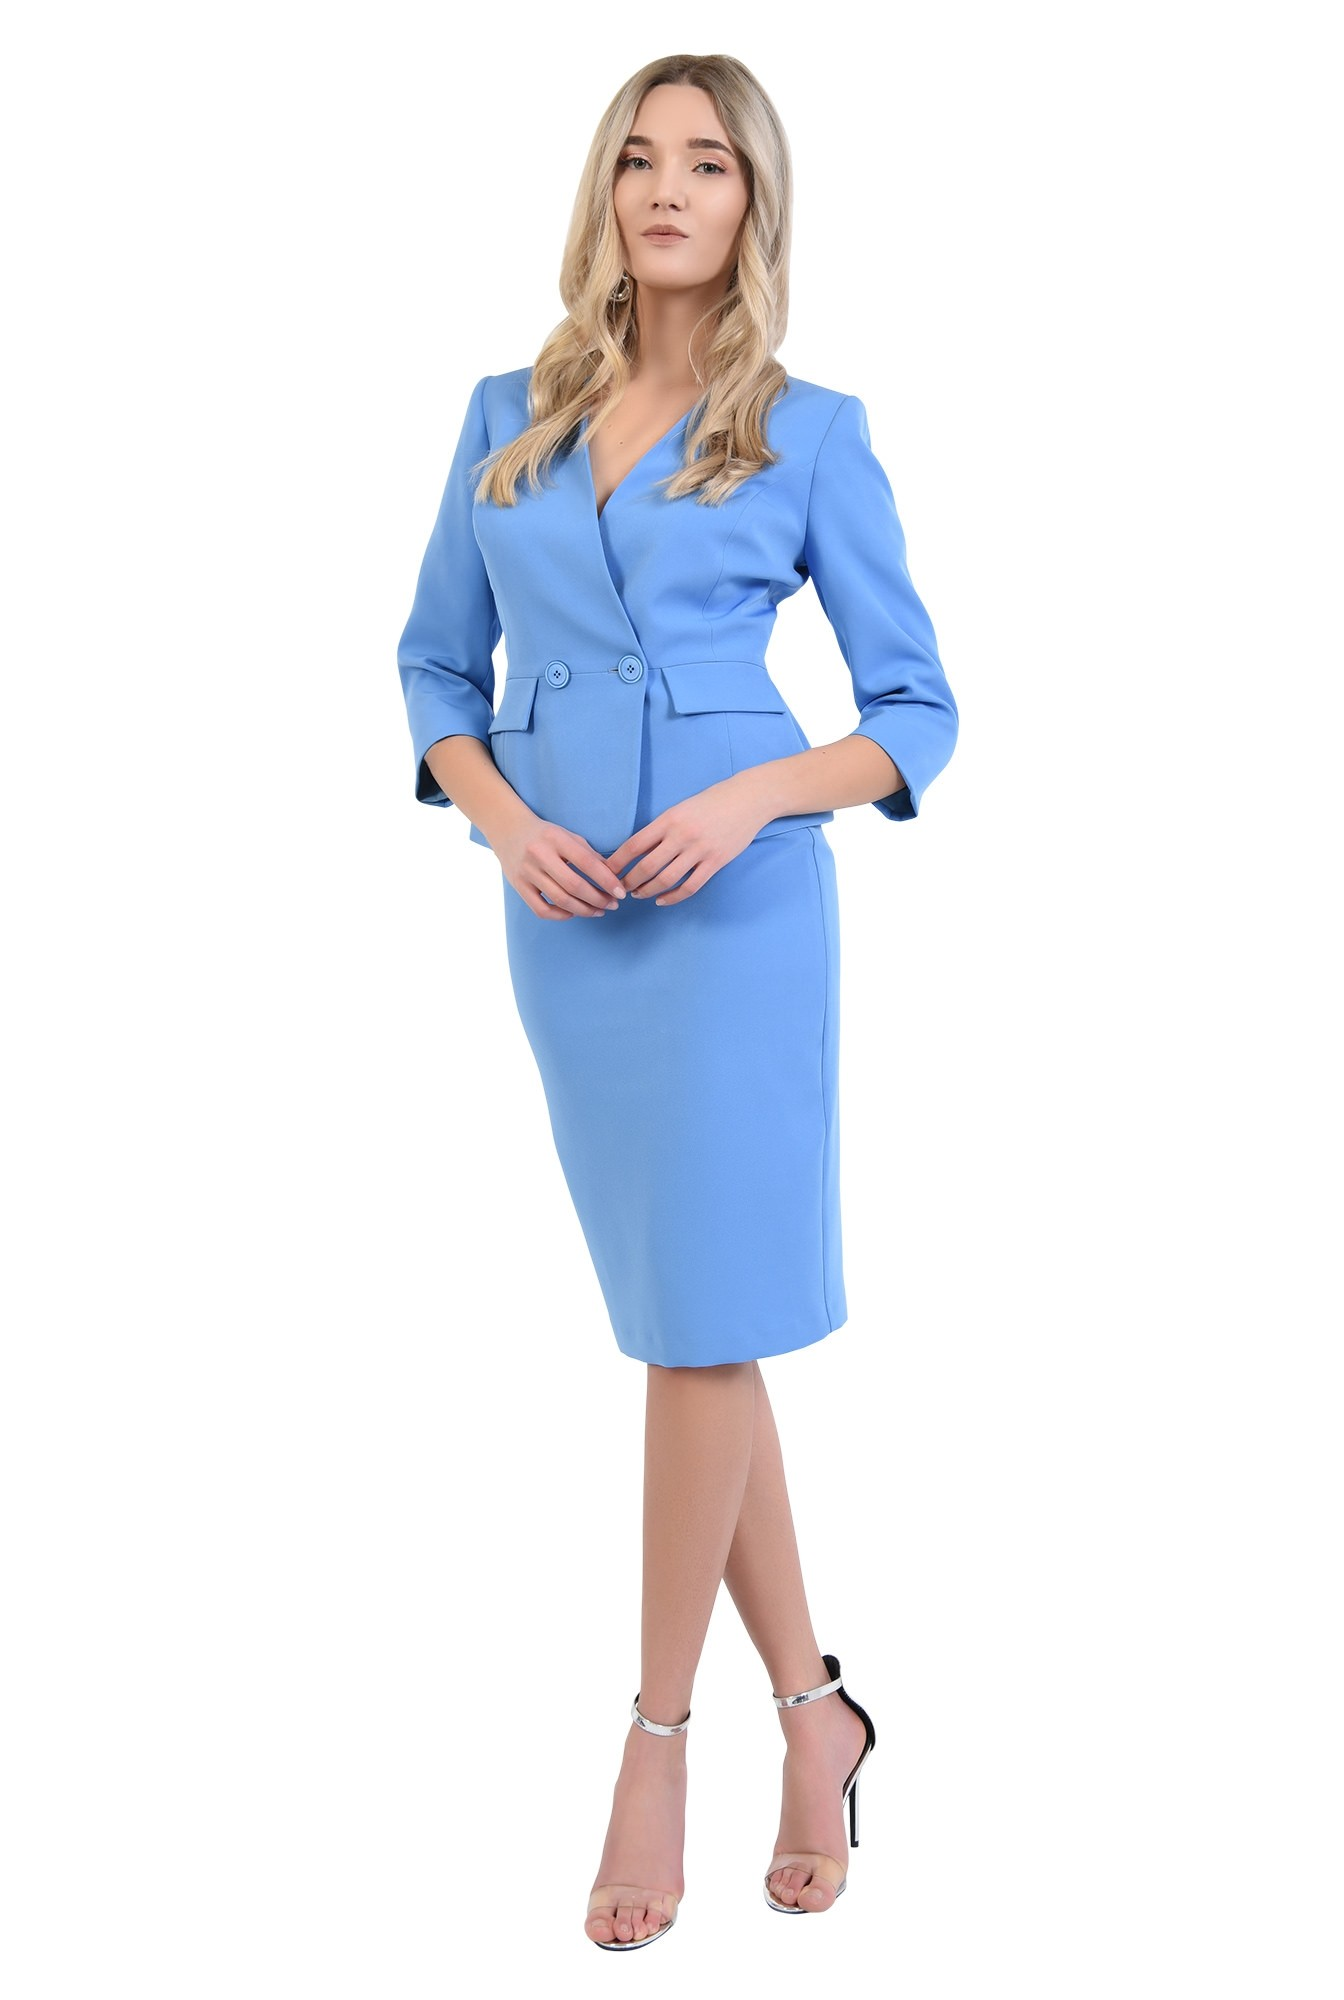 360 - sacou bleu, office, costum, buzunare cu clapa, anchior petrecut